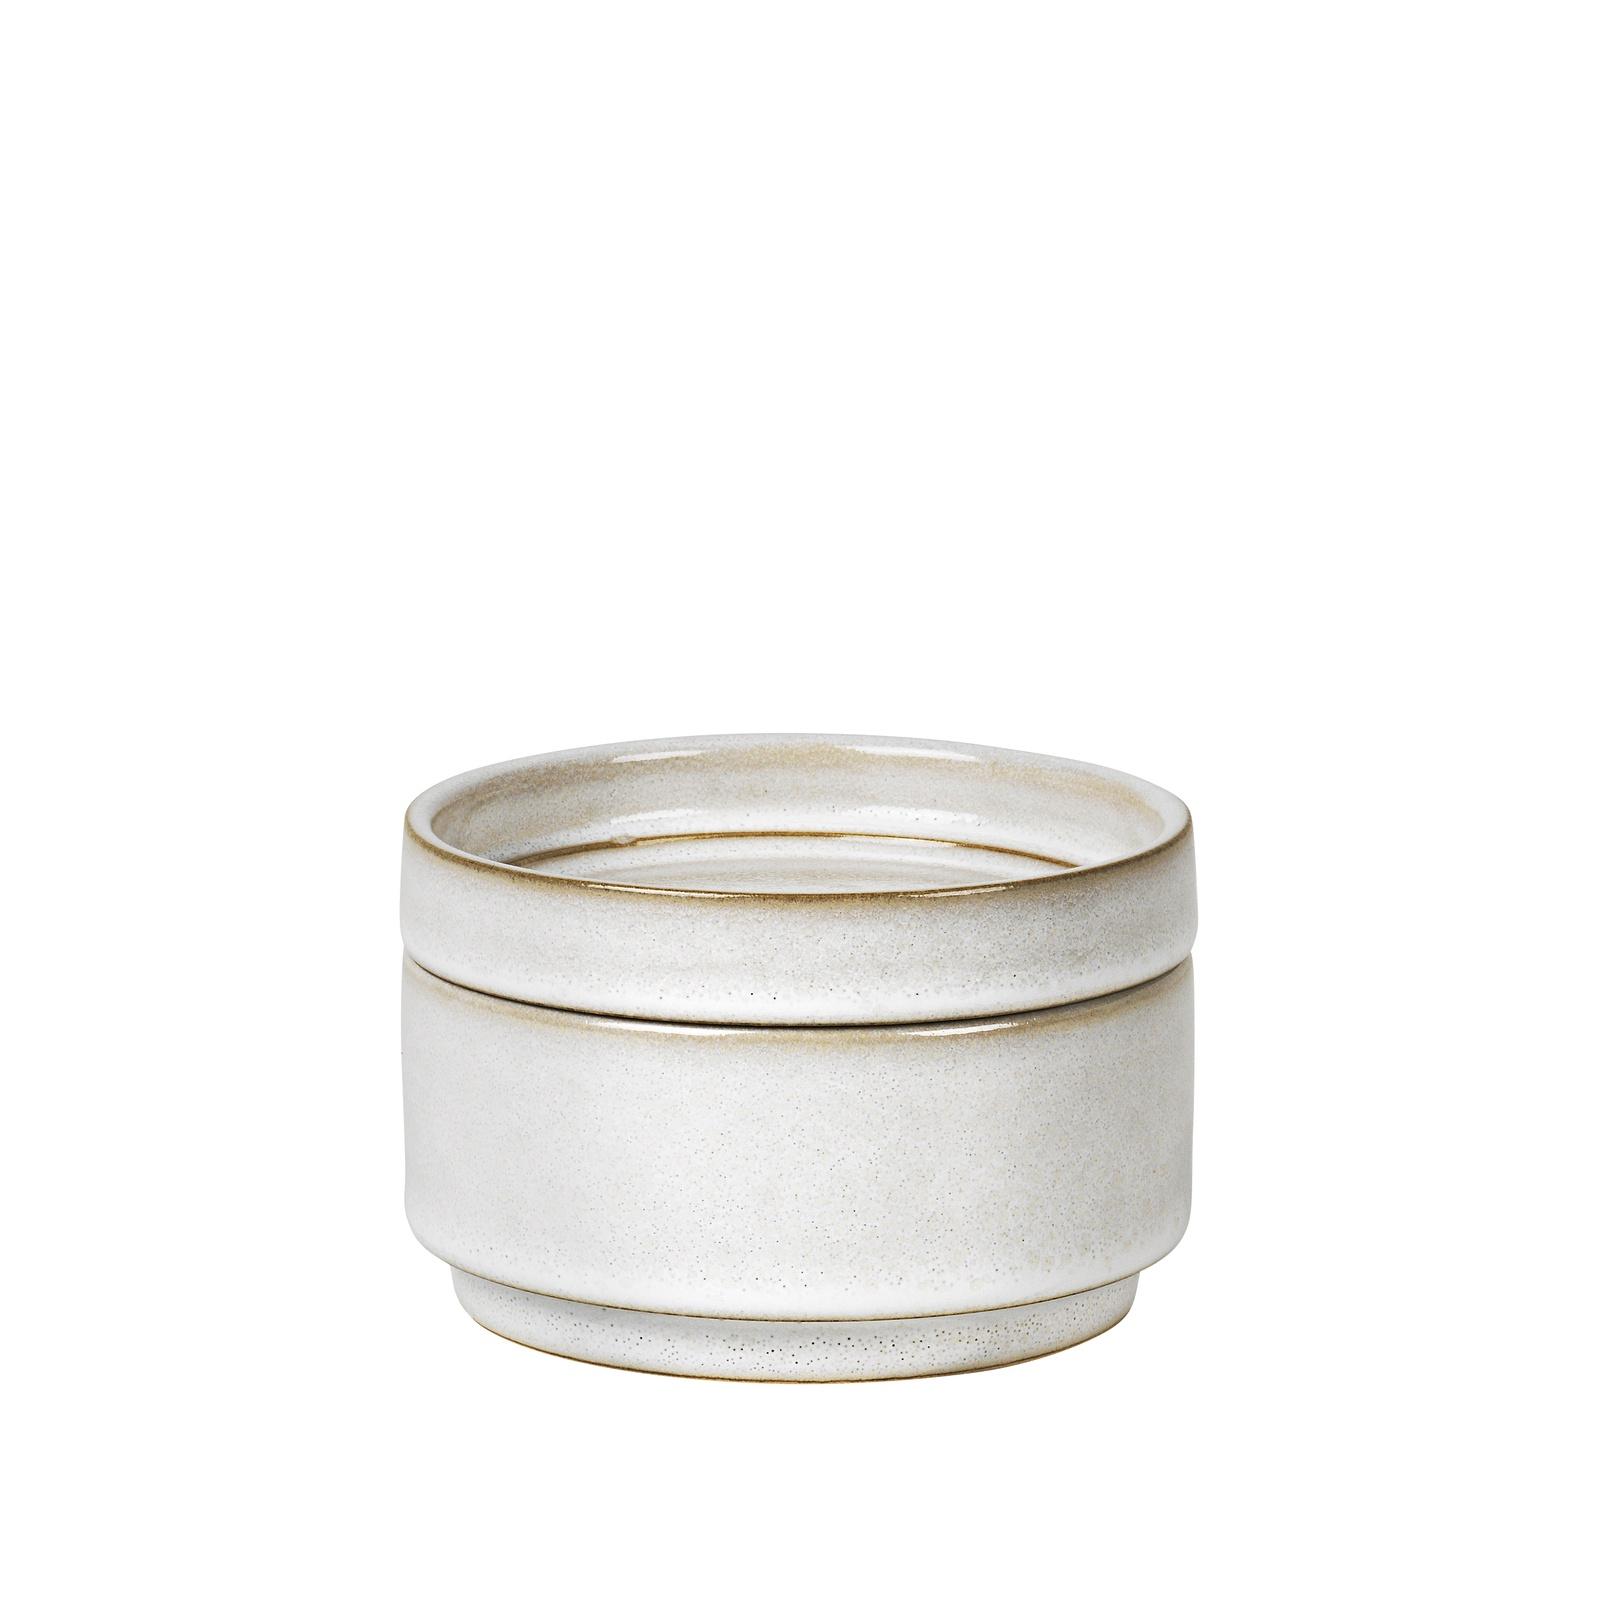 Шкатулка Broste Annie, 15500274, керамика, белый, 12 х 12 х 7.5 см цена